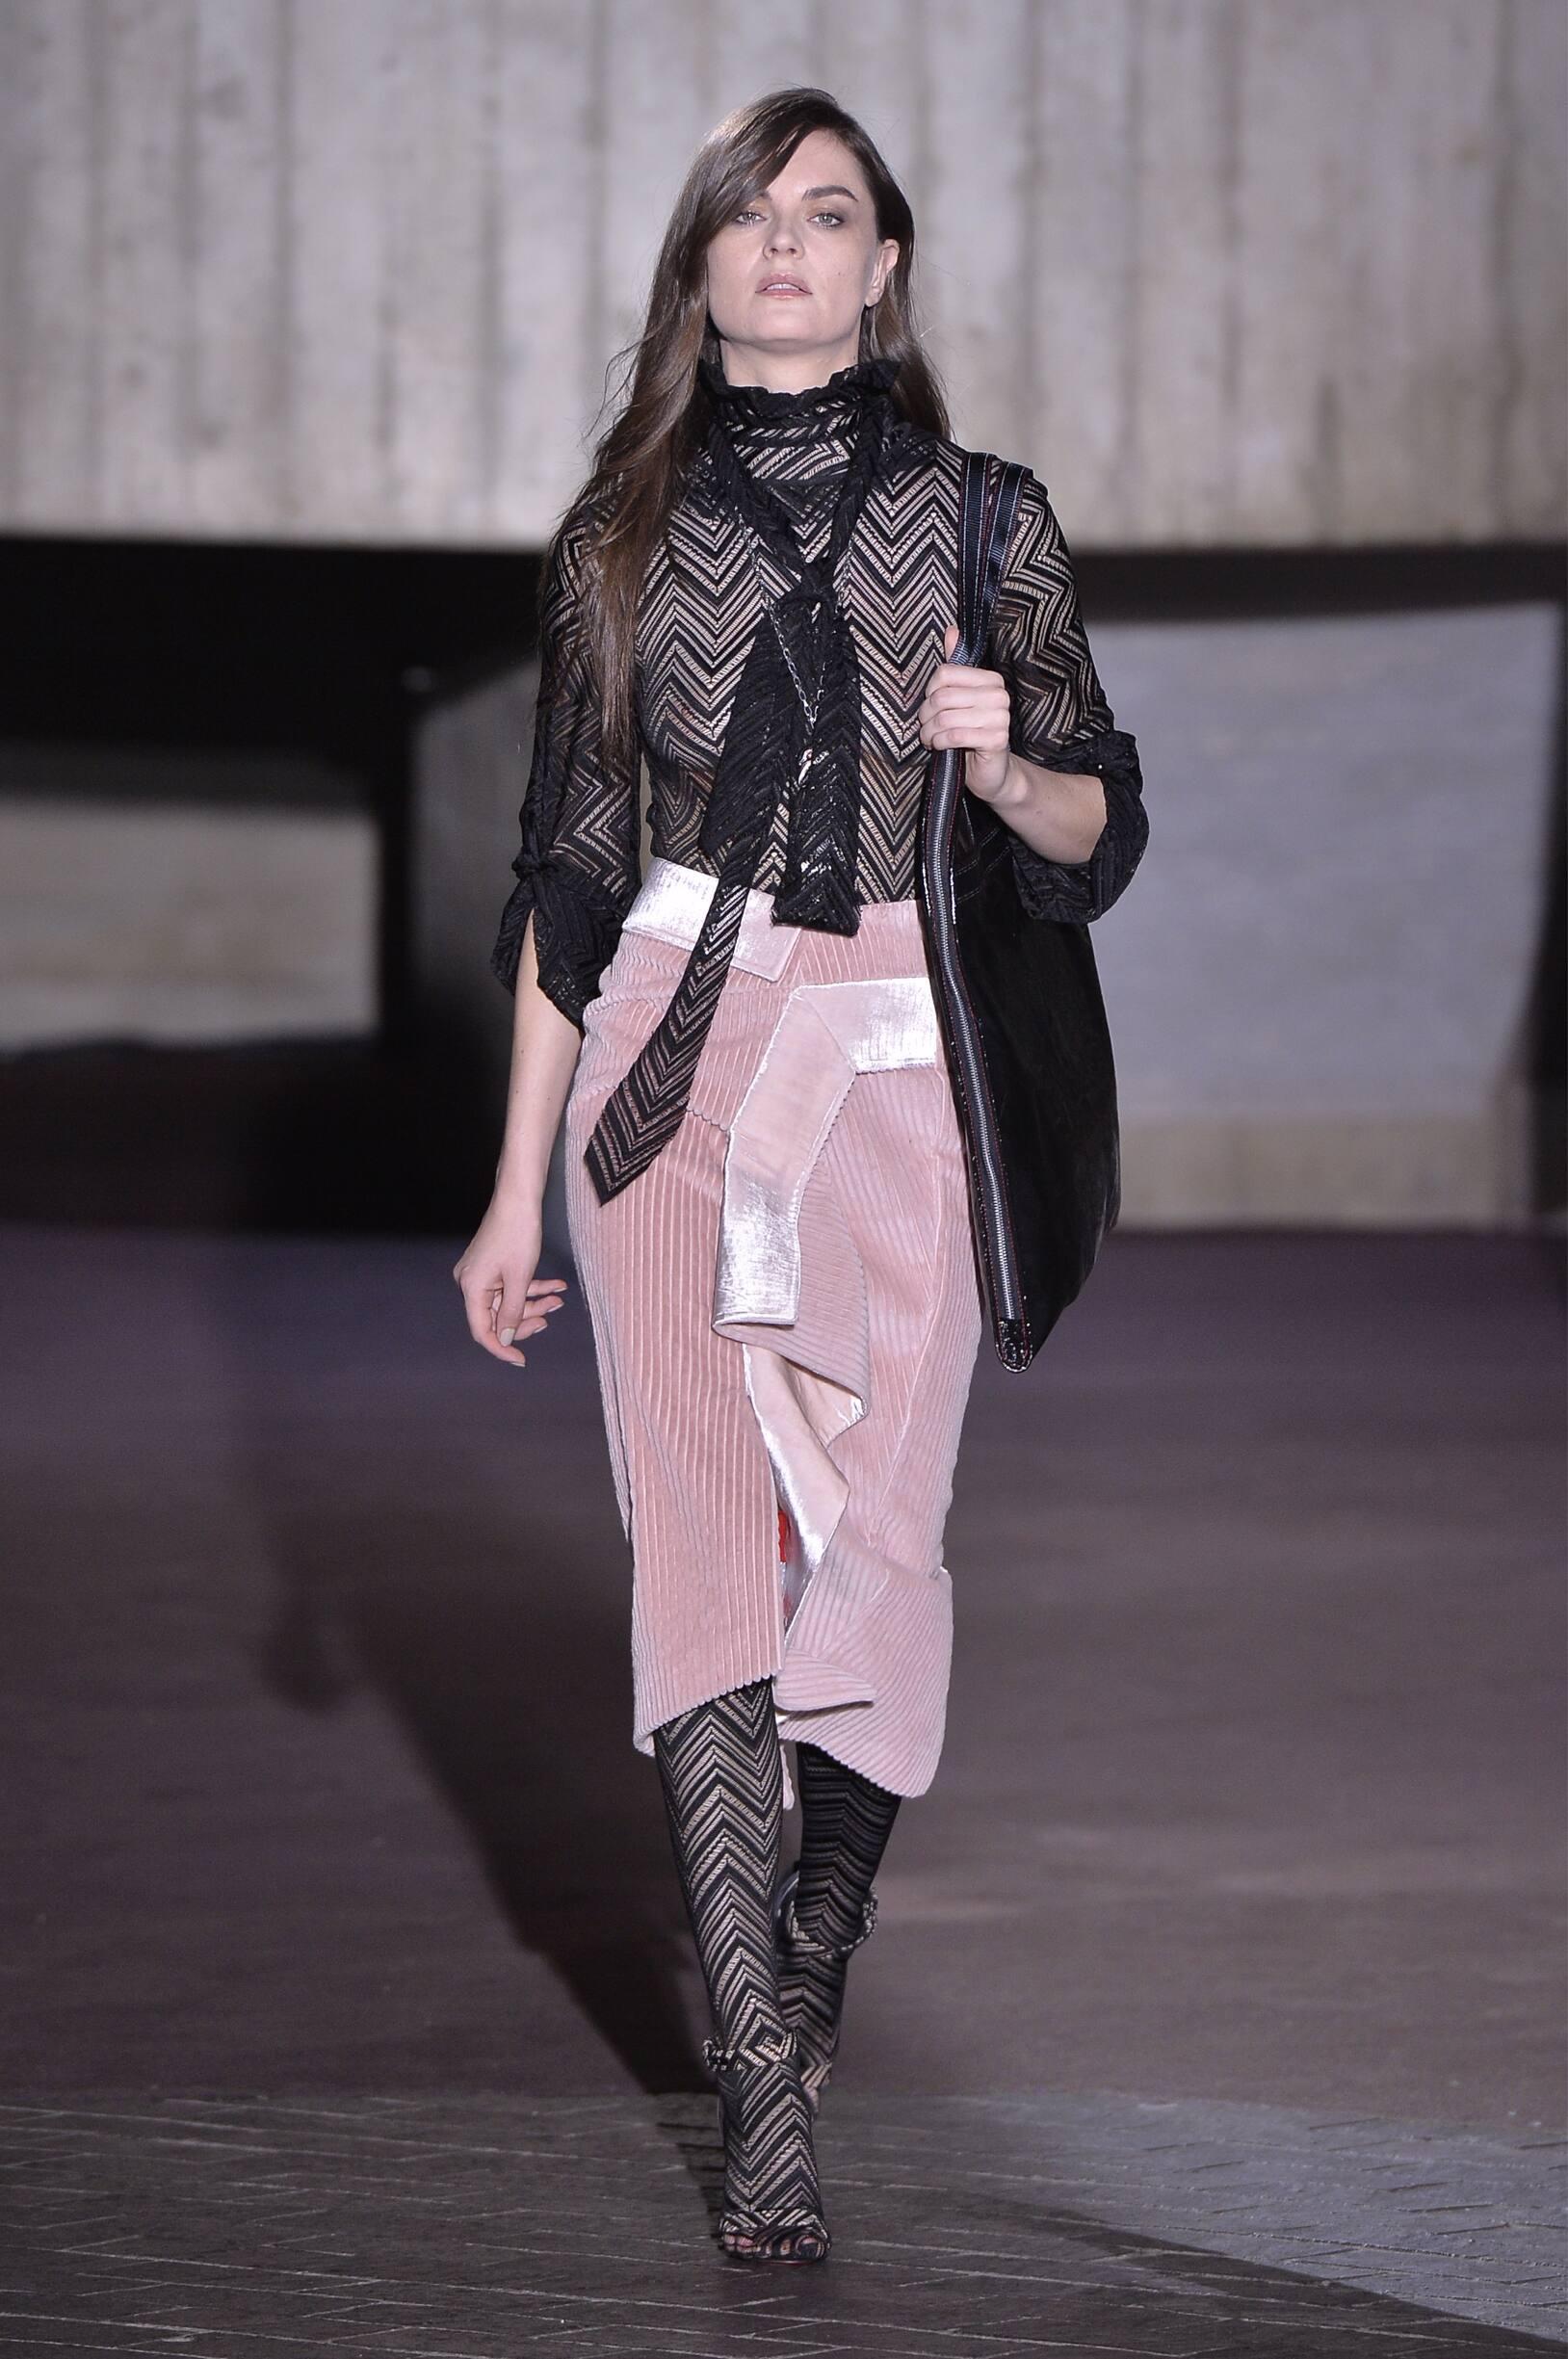 Roland Mouret FW 2018 Womenswear